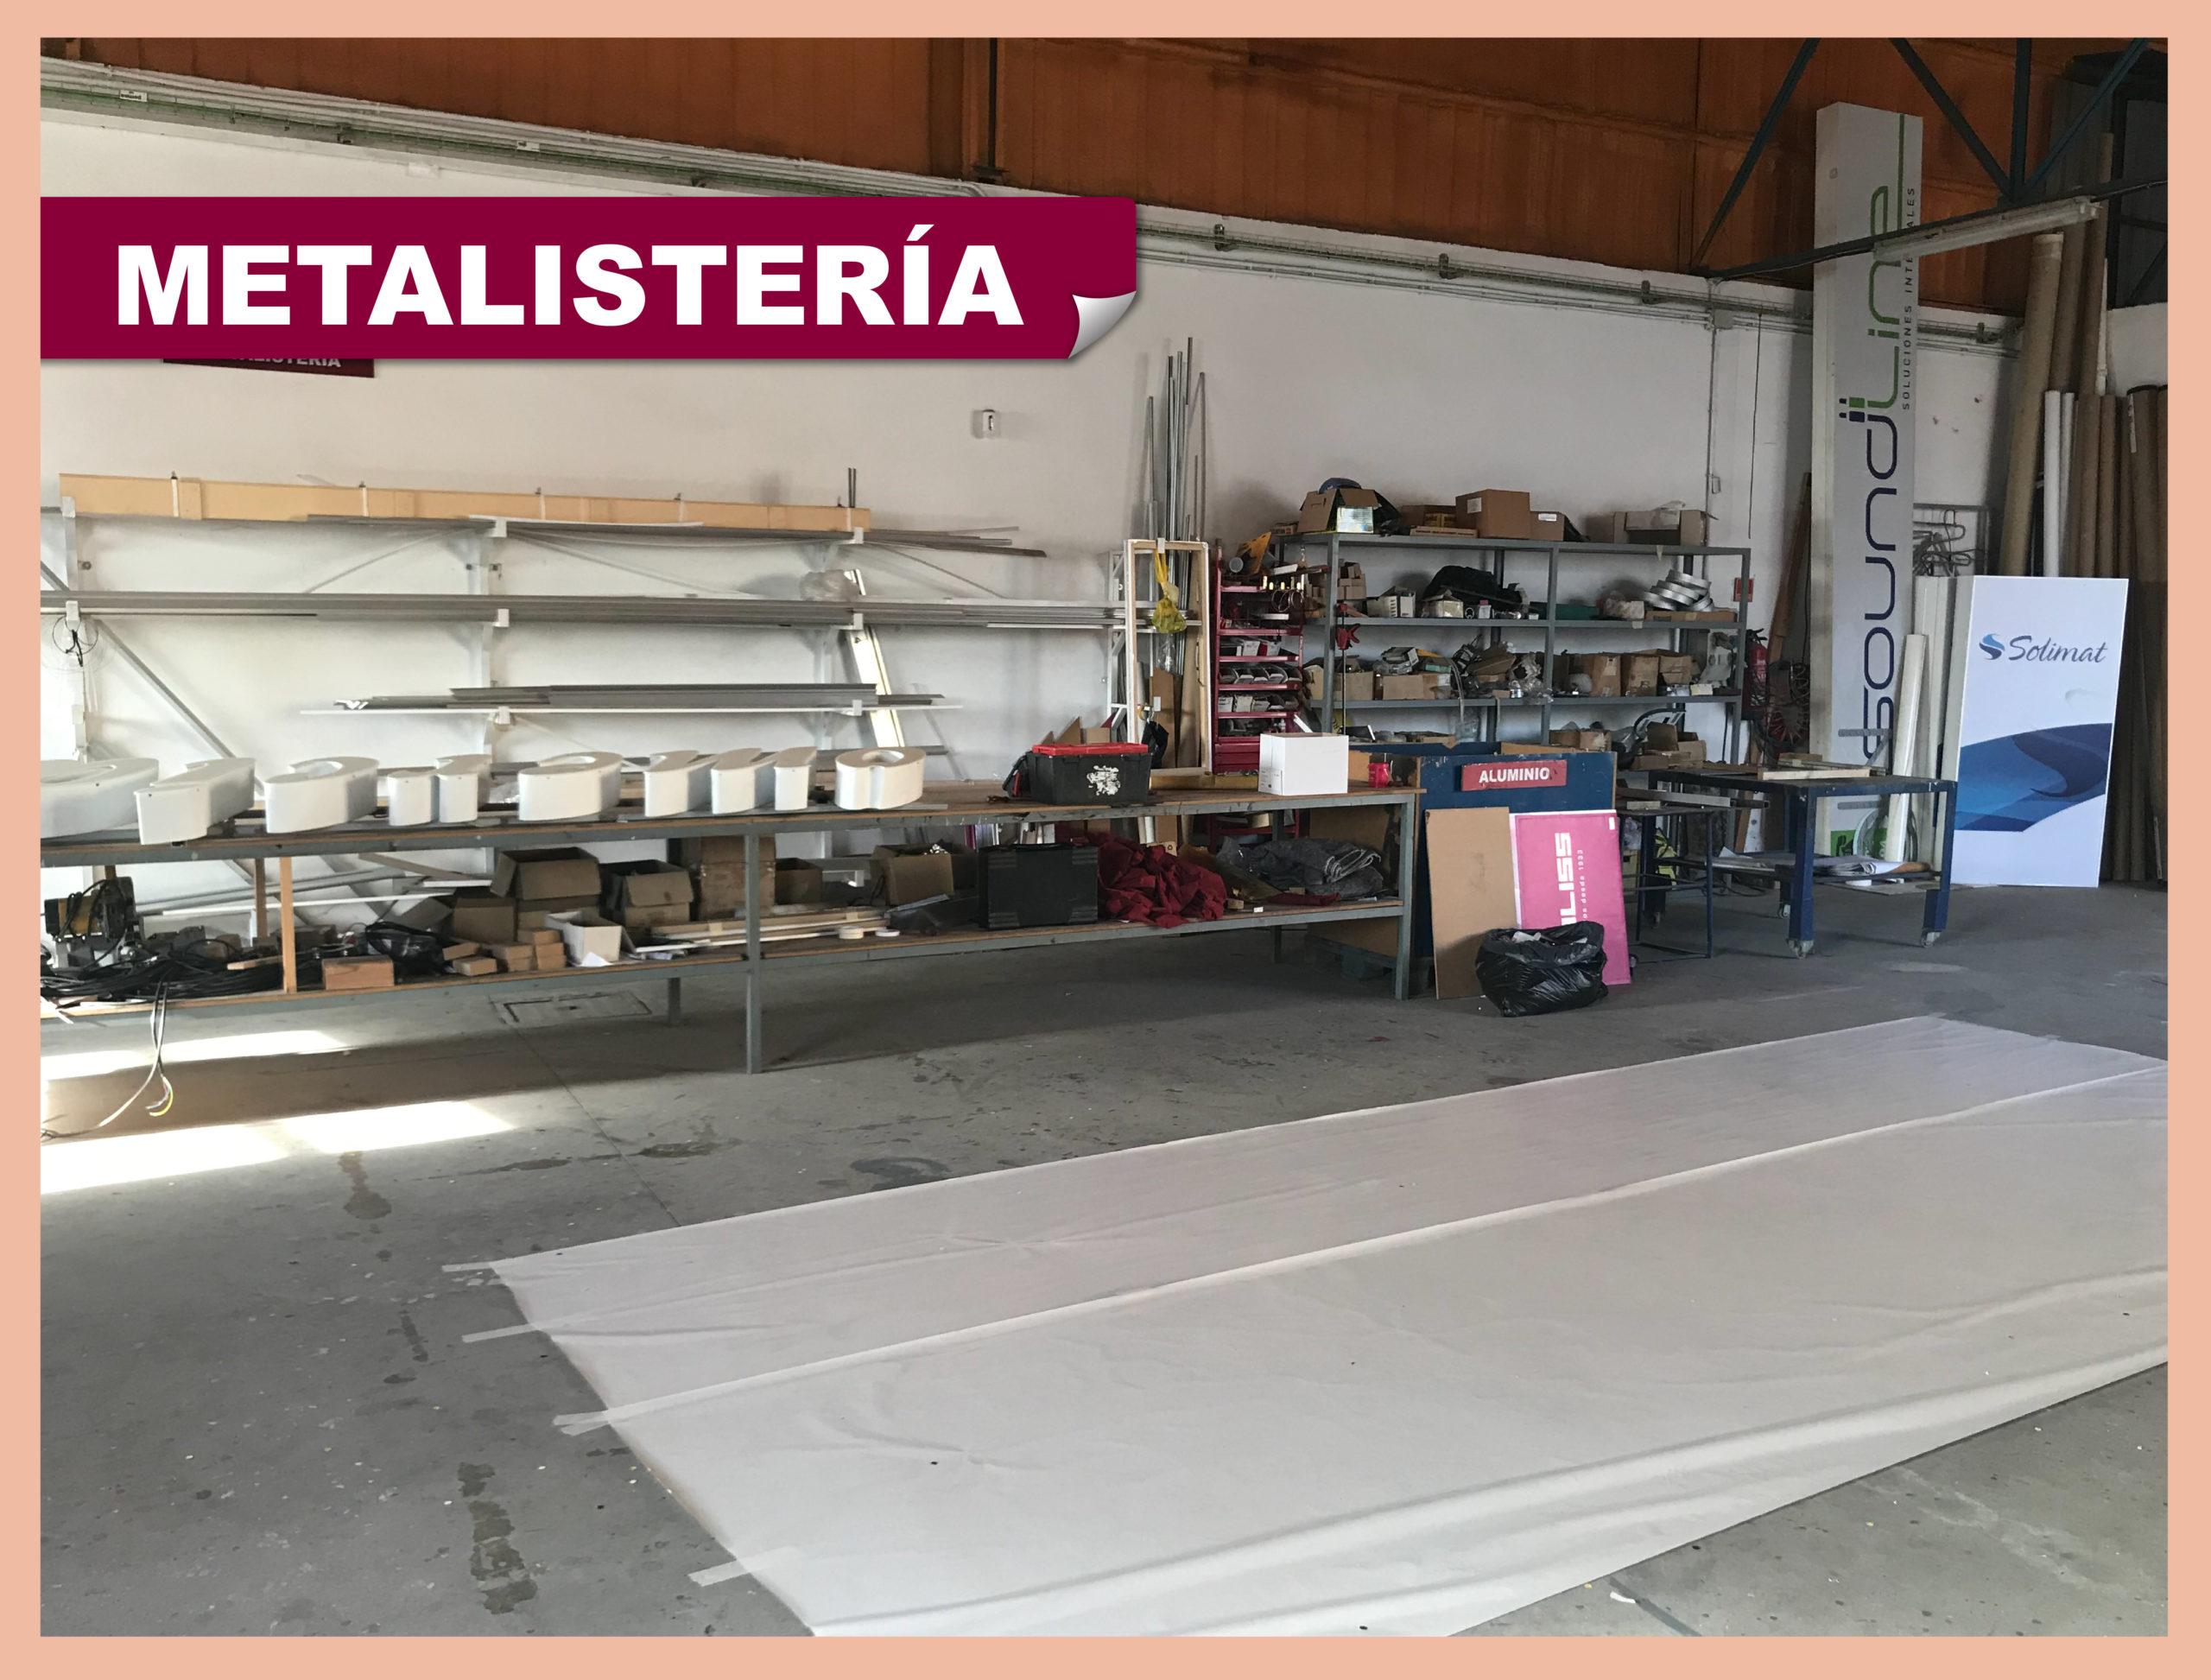 metalisteria